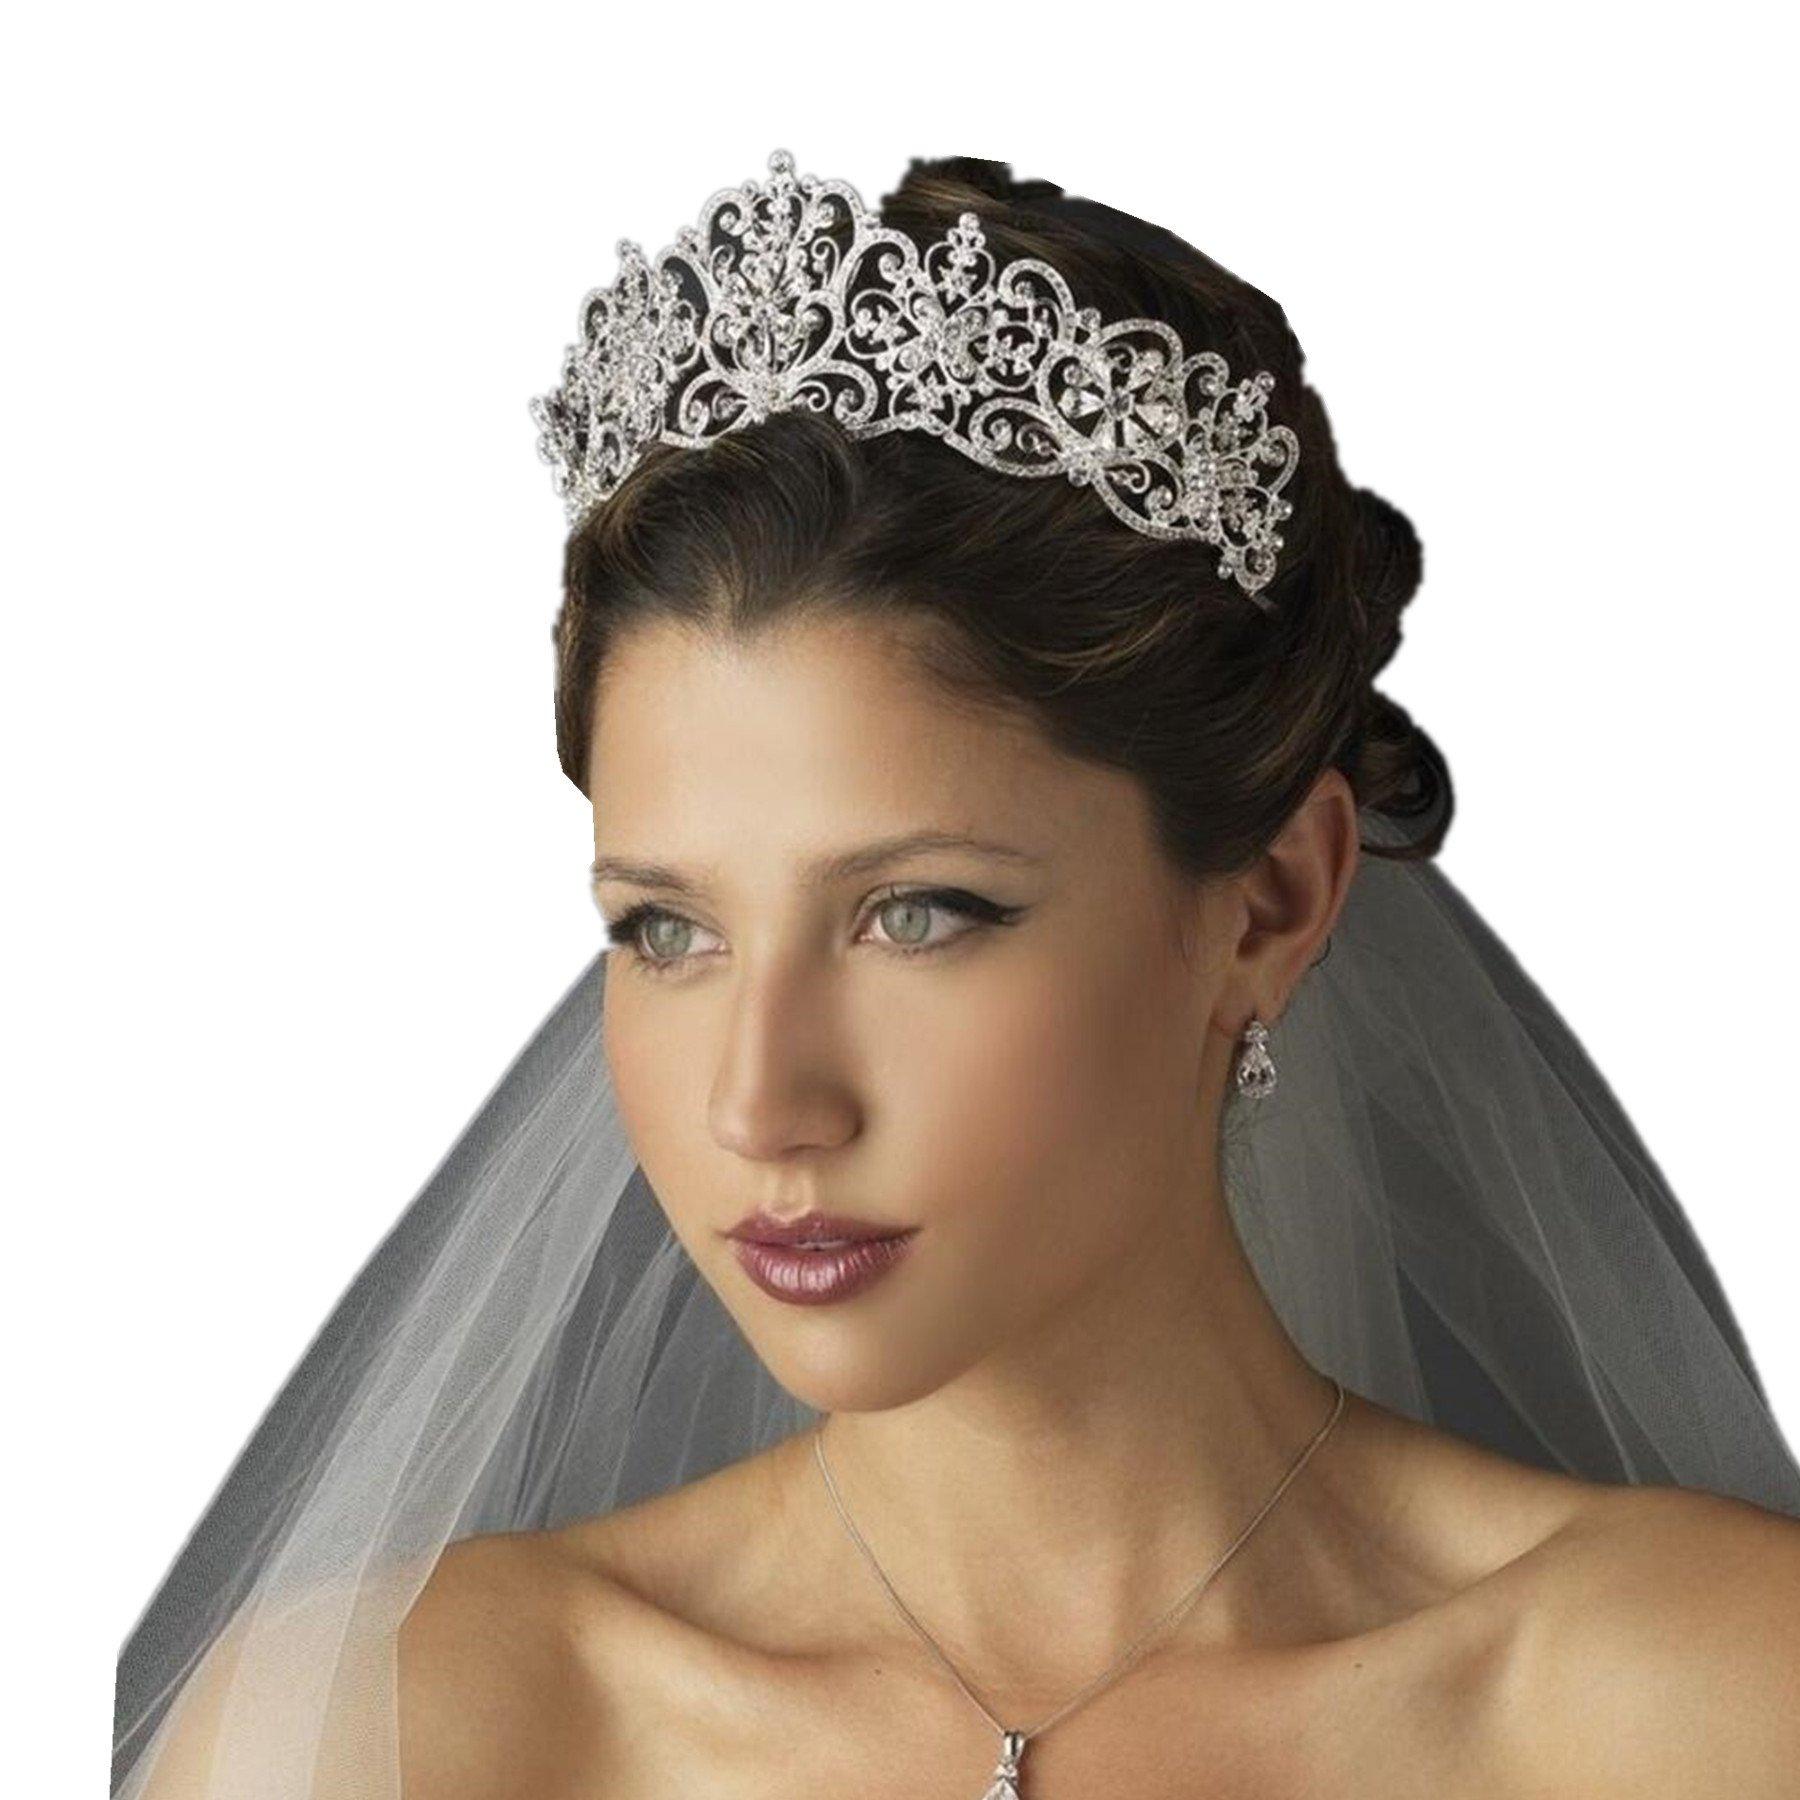 Wiipu Luxury Crystal Rhinestone Royal Princess Wedding Bridal Tiara Crown(B641)